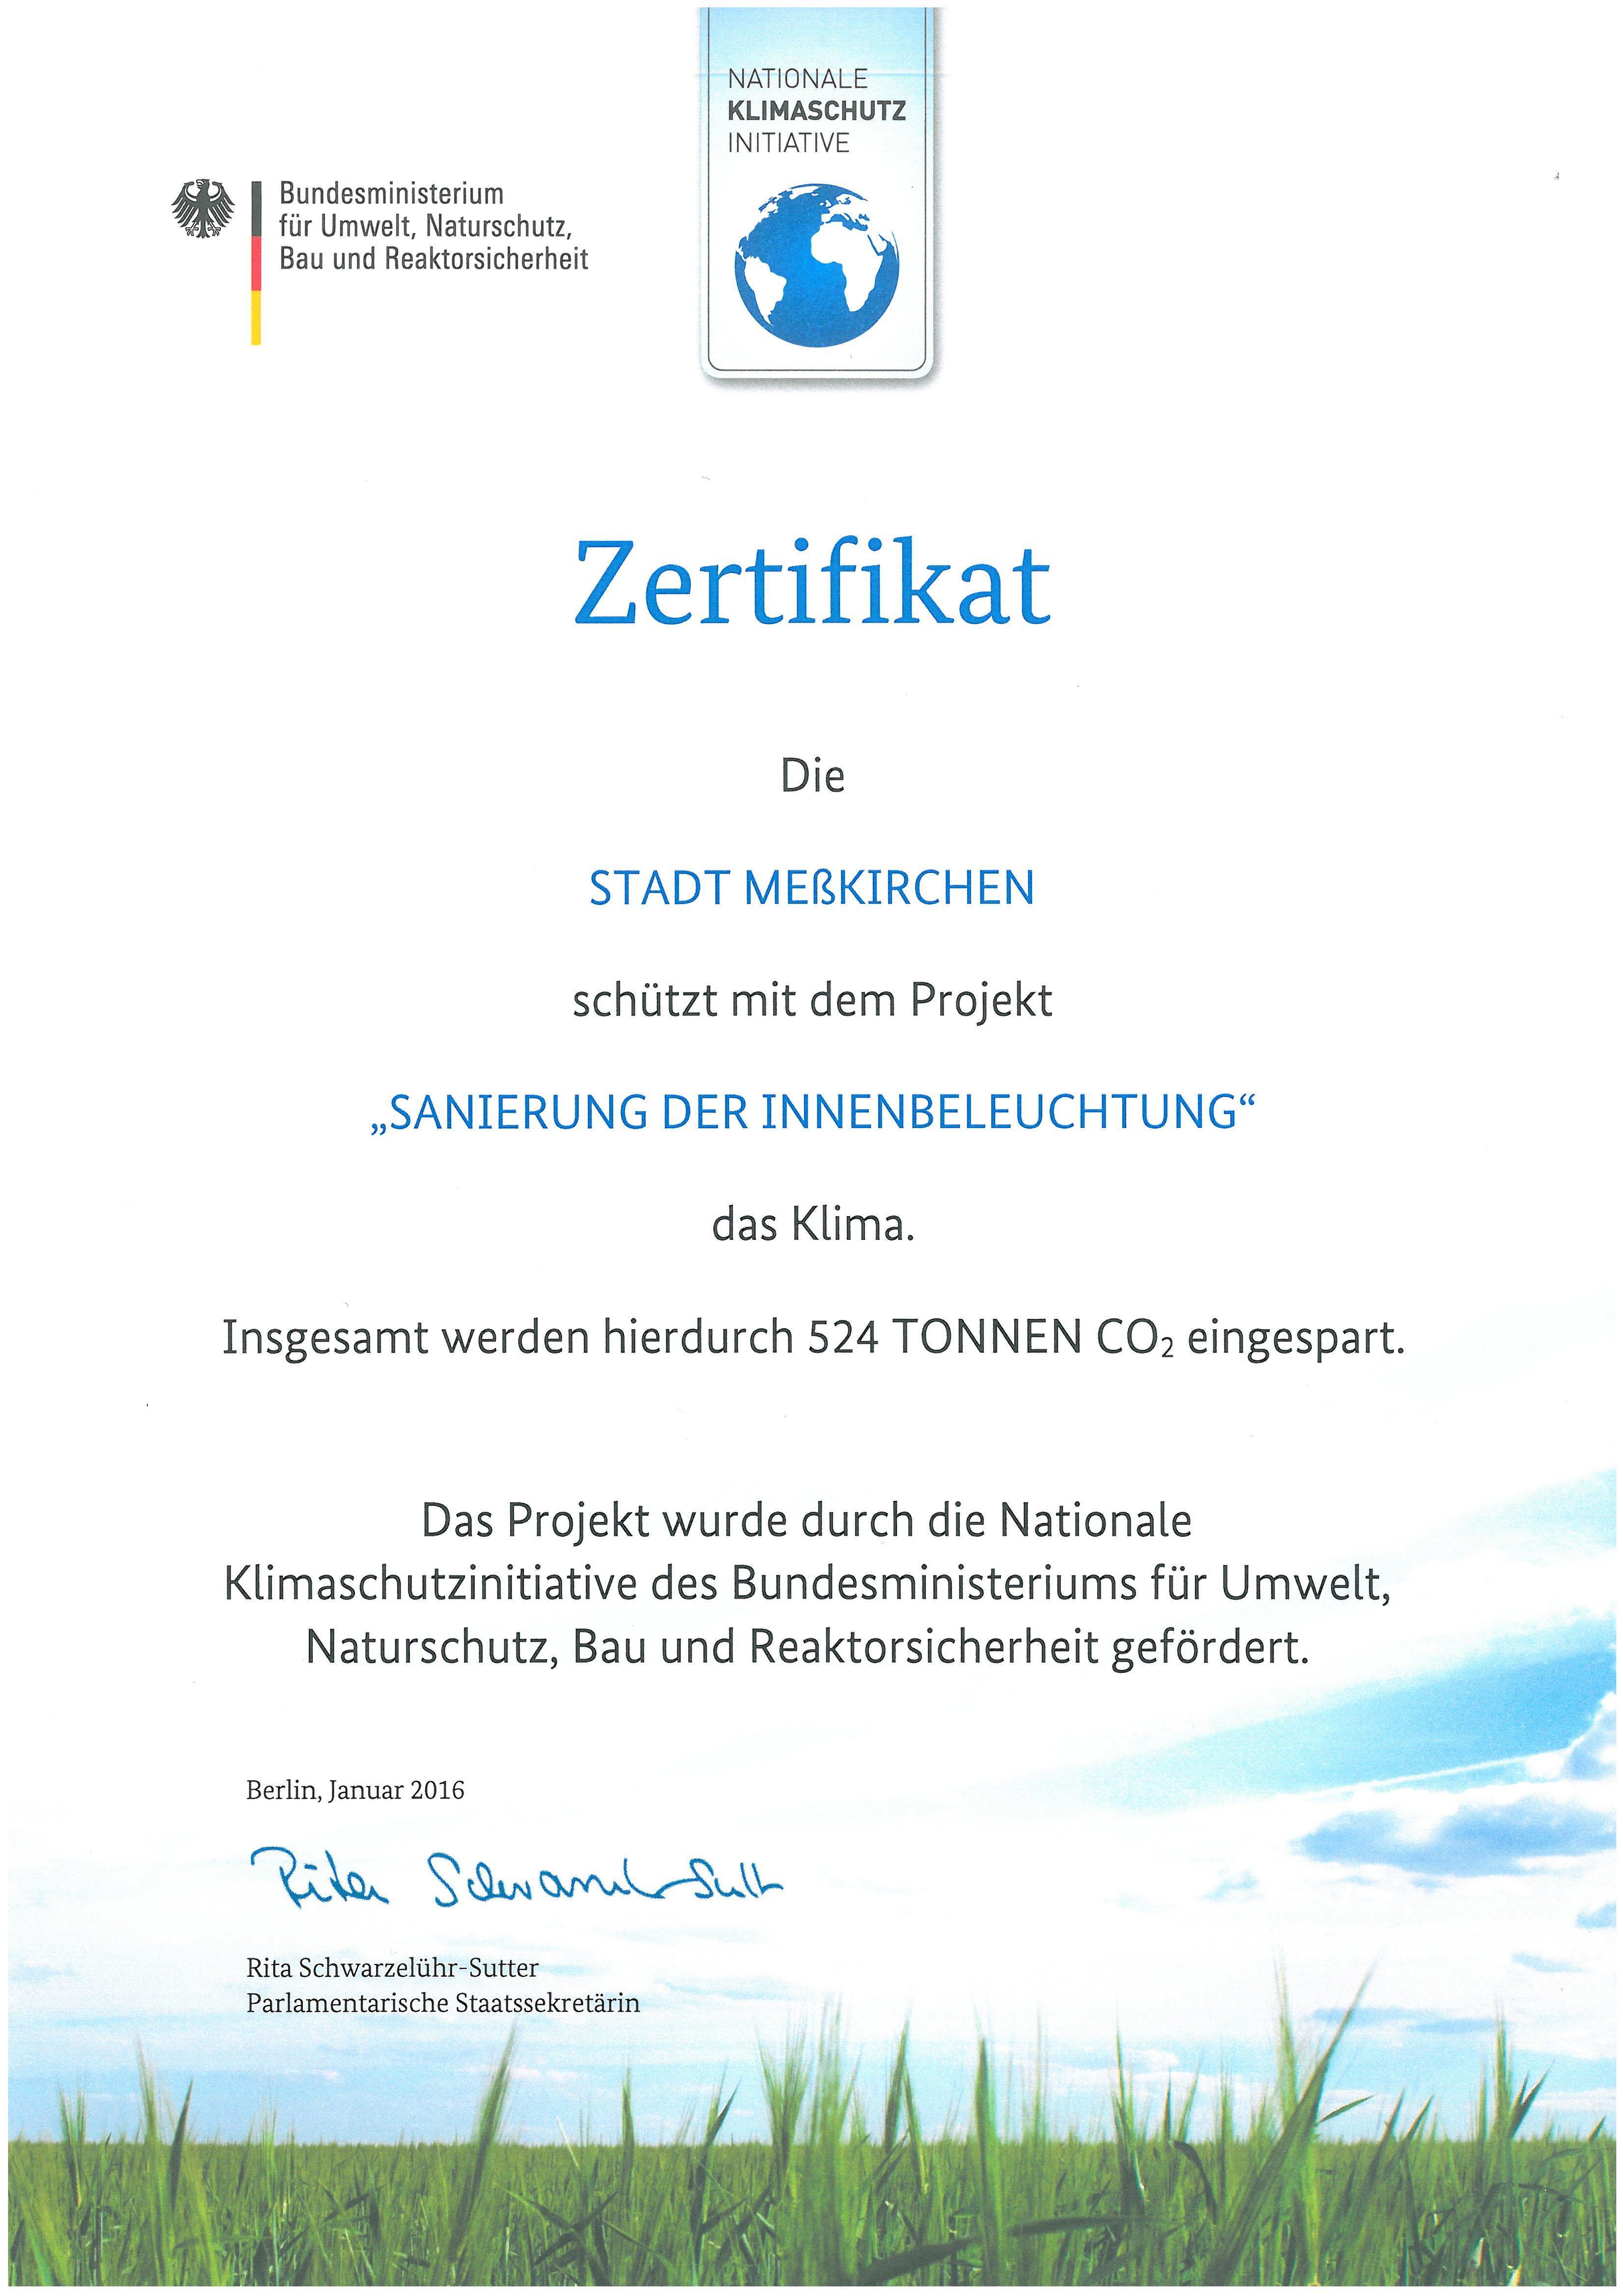 Zertifikat_Klimaschutzinitiative